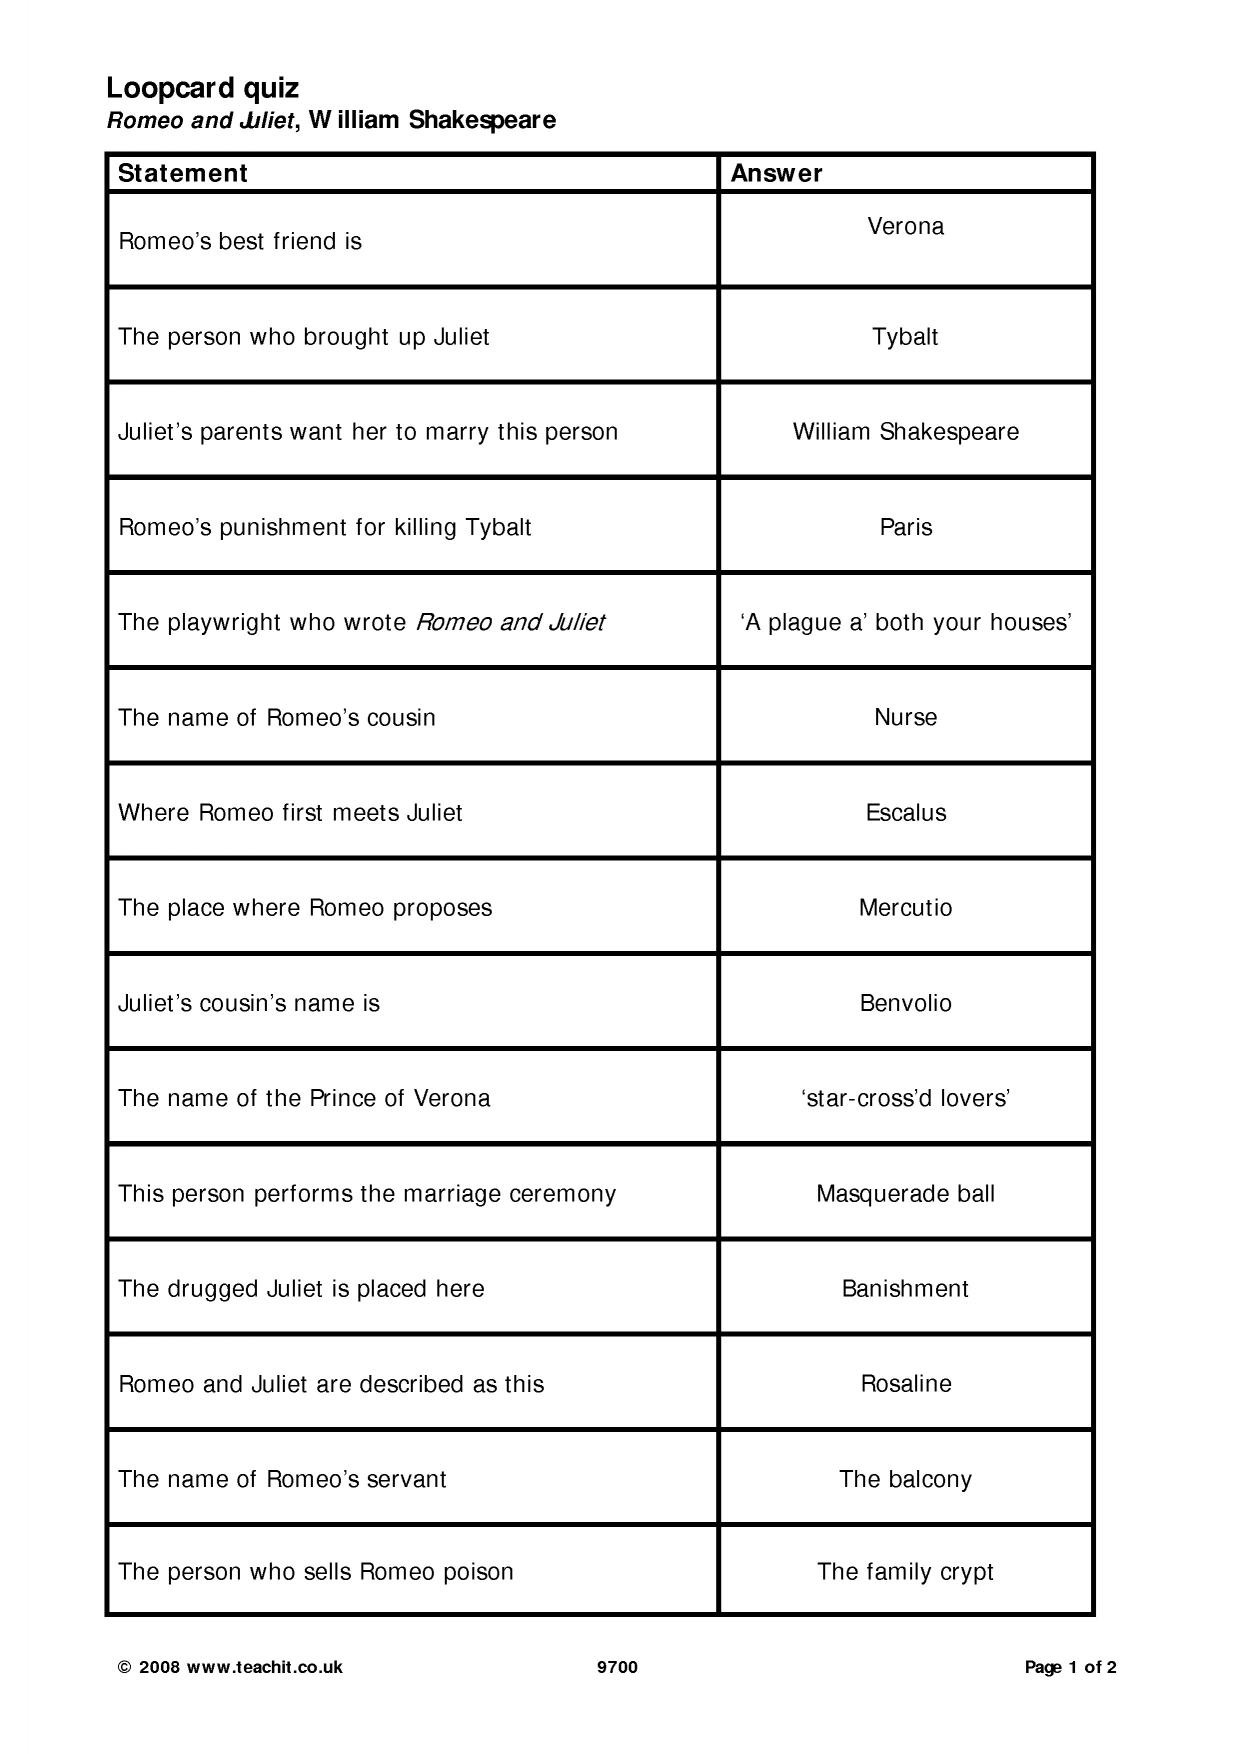 Romeo And Juliet Prologue Worksheet